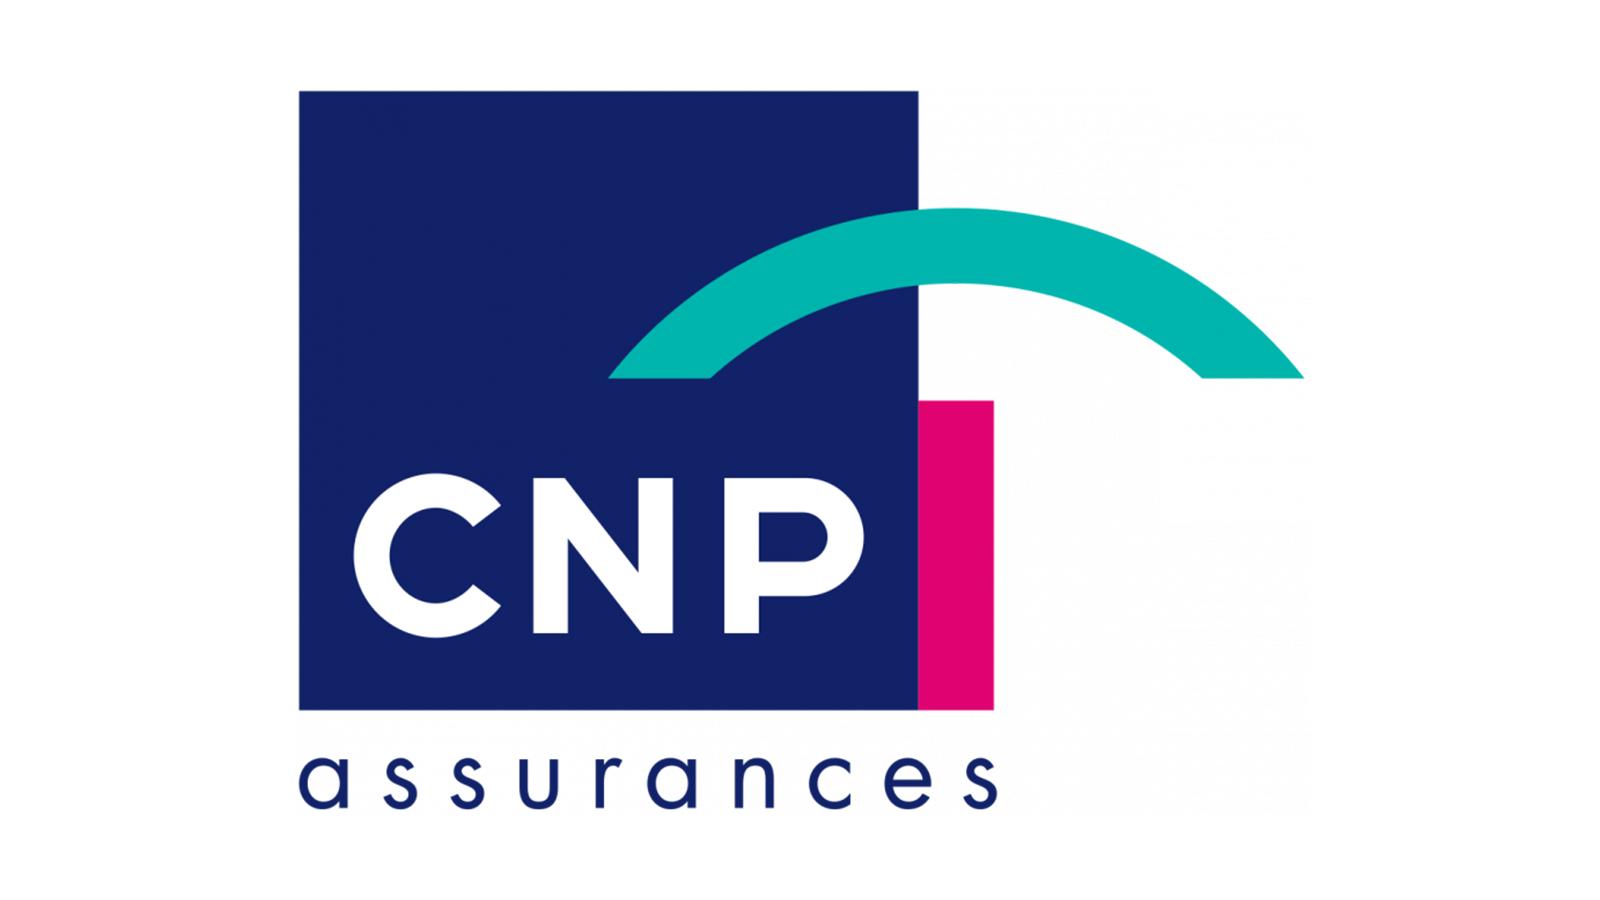 CNP Assurances: Σημαντική συμφωνία με την Caixa Econômica Federal